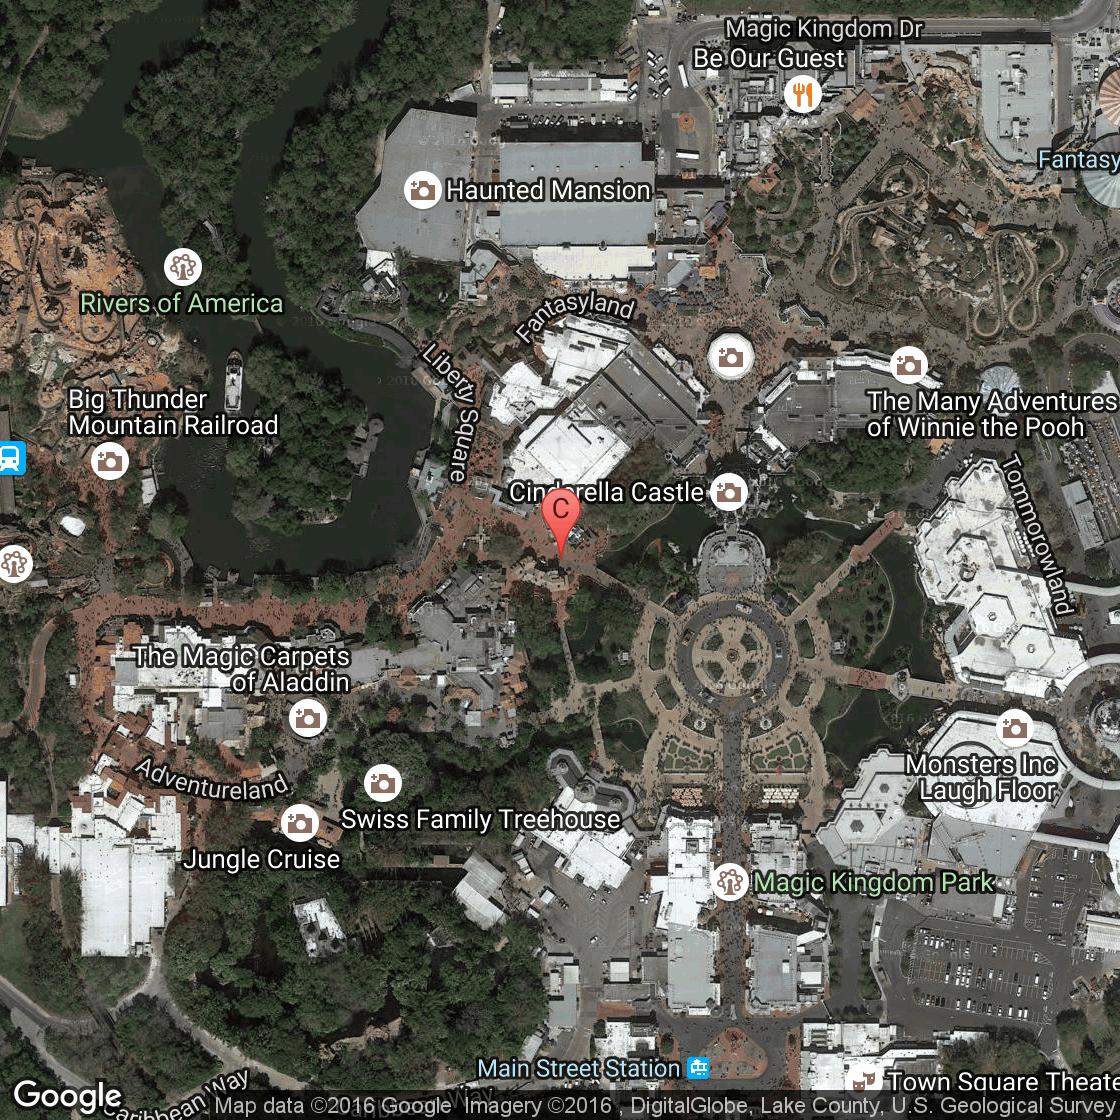 Comparison of Walt Disney World  Walt Disneyland  USA Today